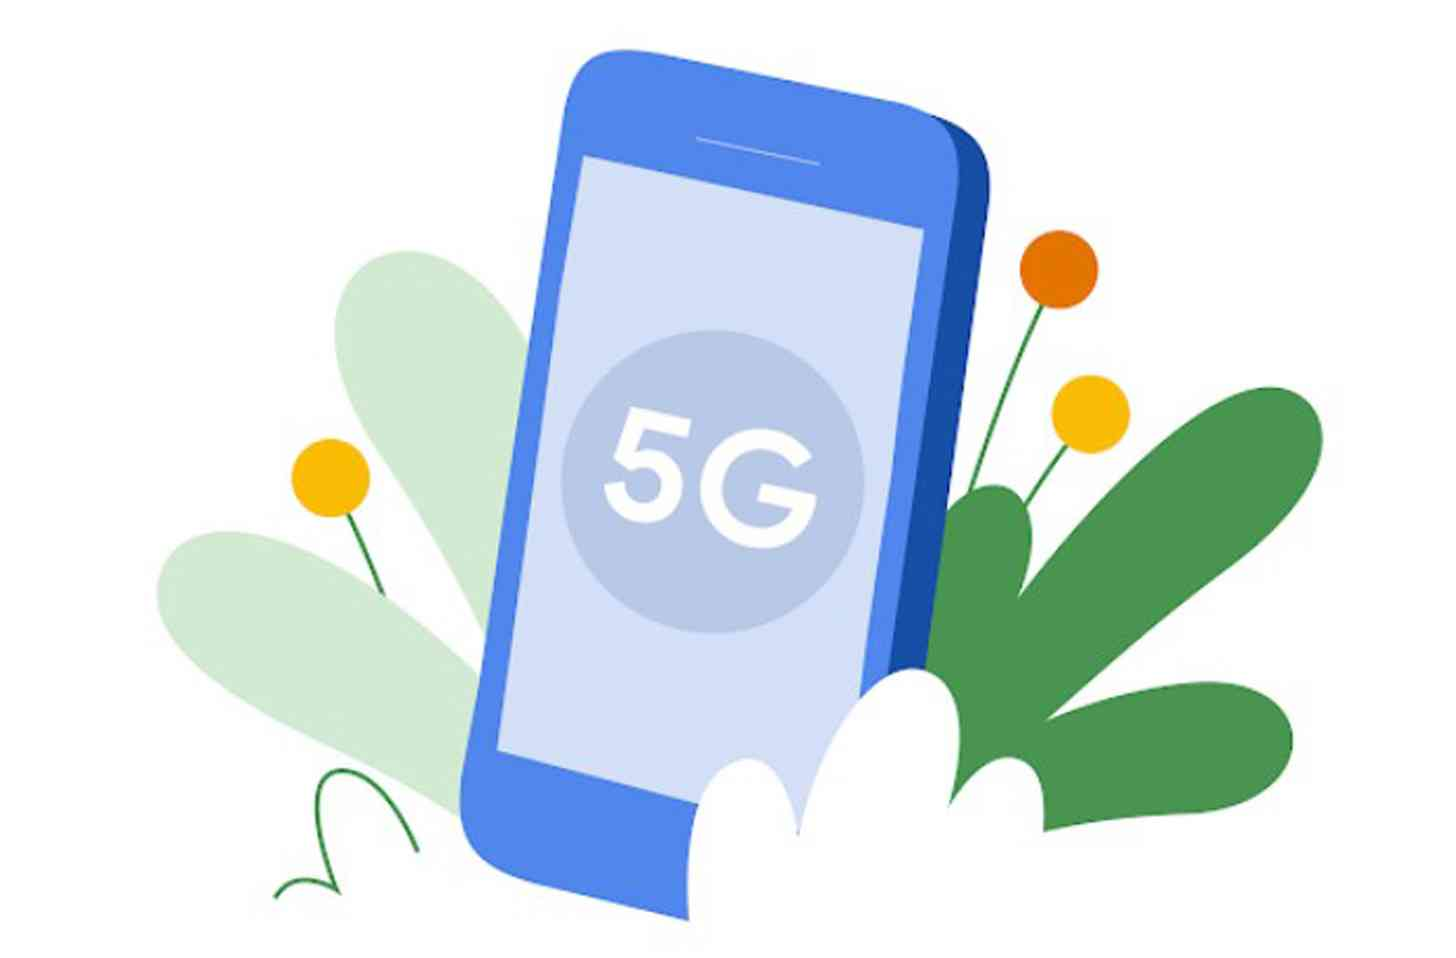 Google Fi 5G